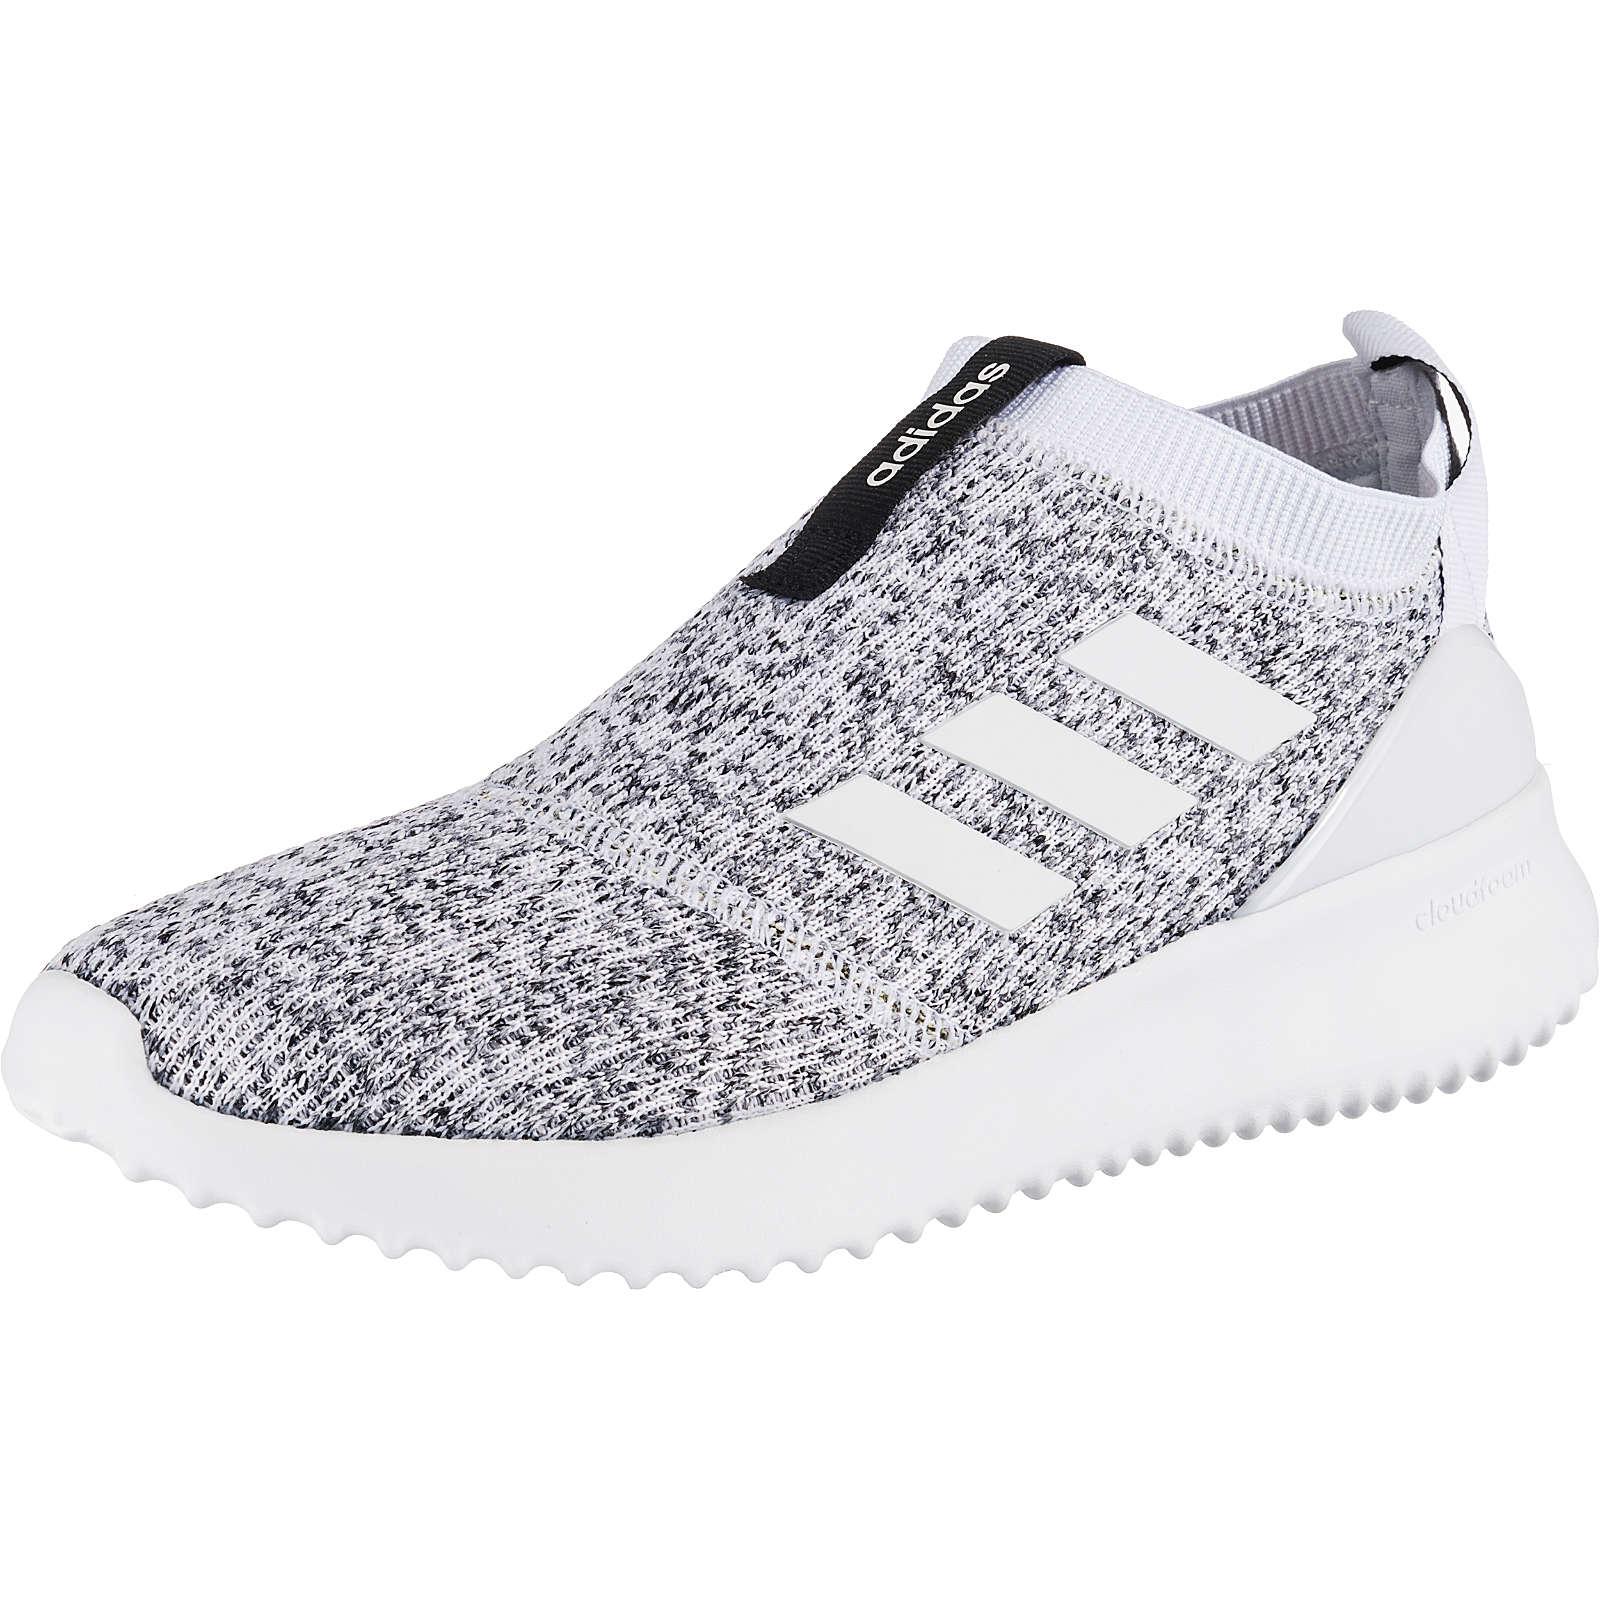 adidas Sport Inspired Ultimafusion Sneakers Low hellgrau Damen Gr. 38